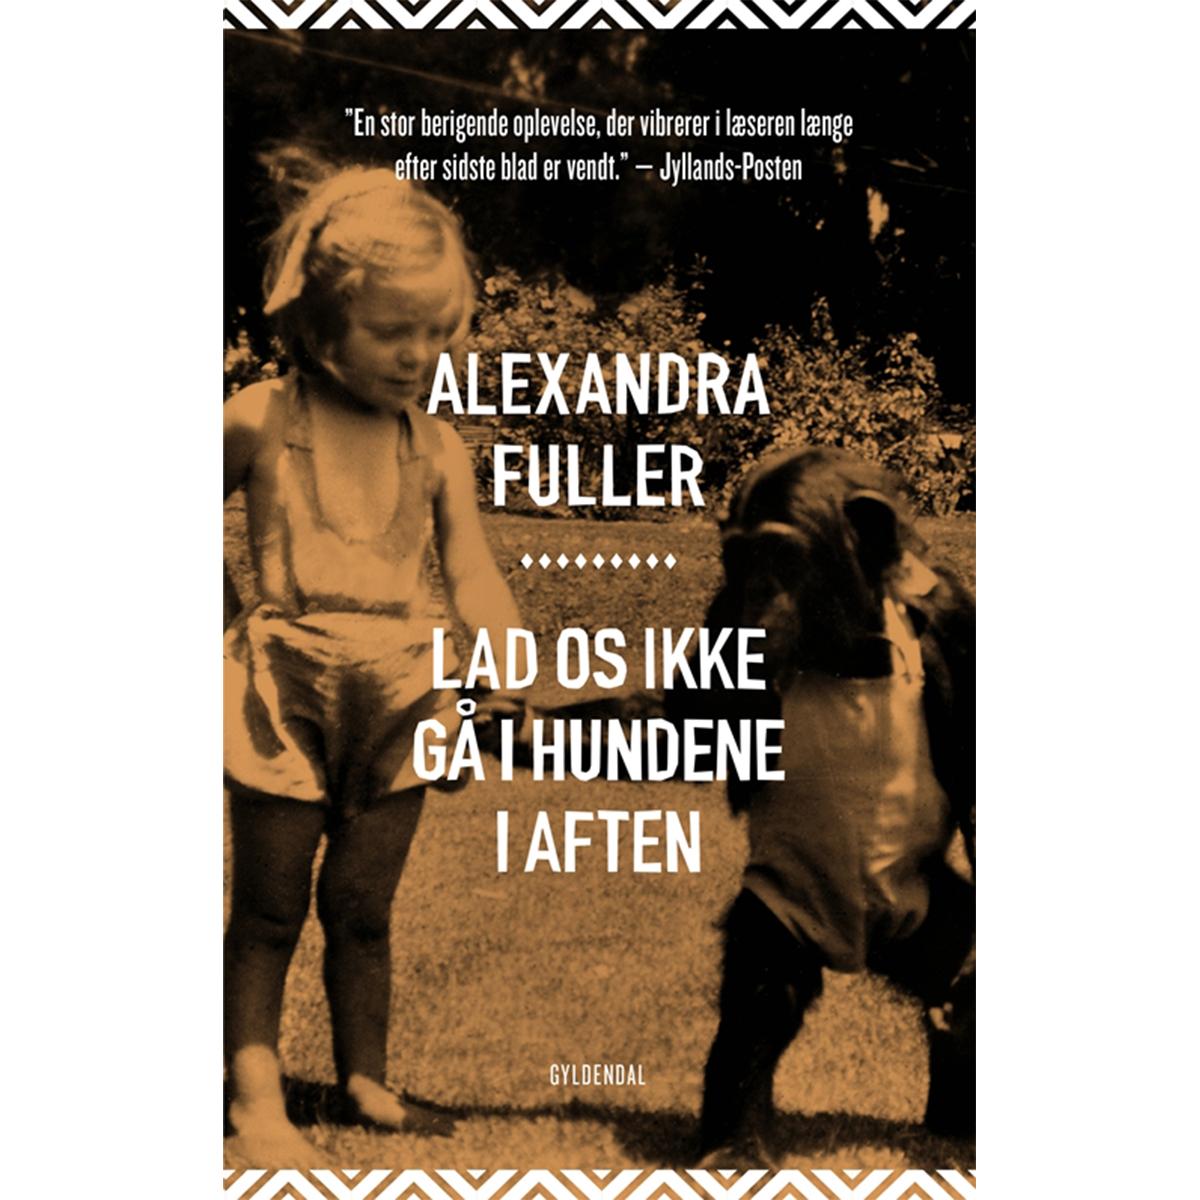 Lad os ikke gå i hundene i aften - en afrikansk barndom - Paperback